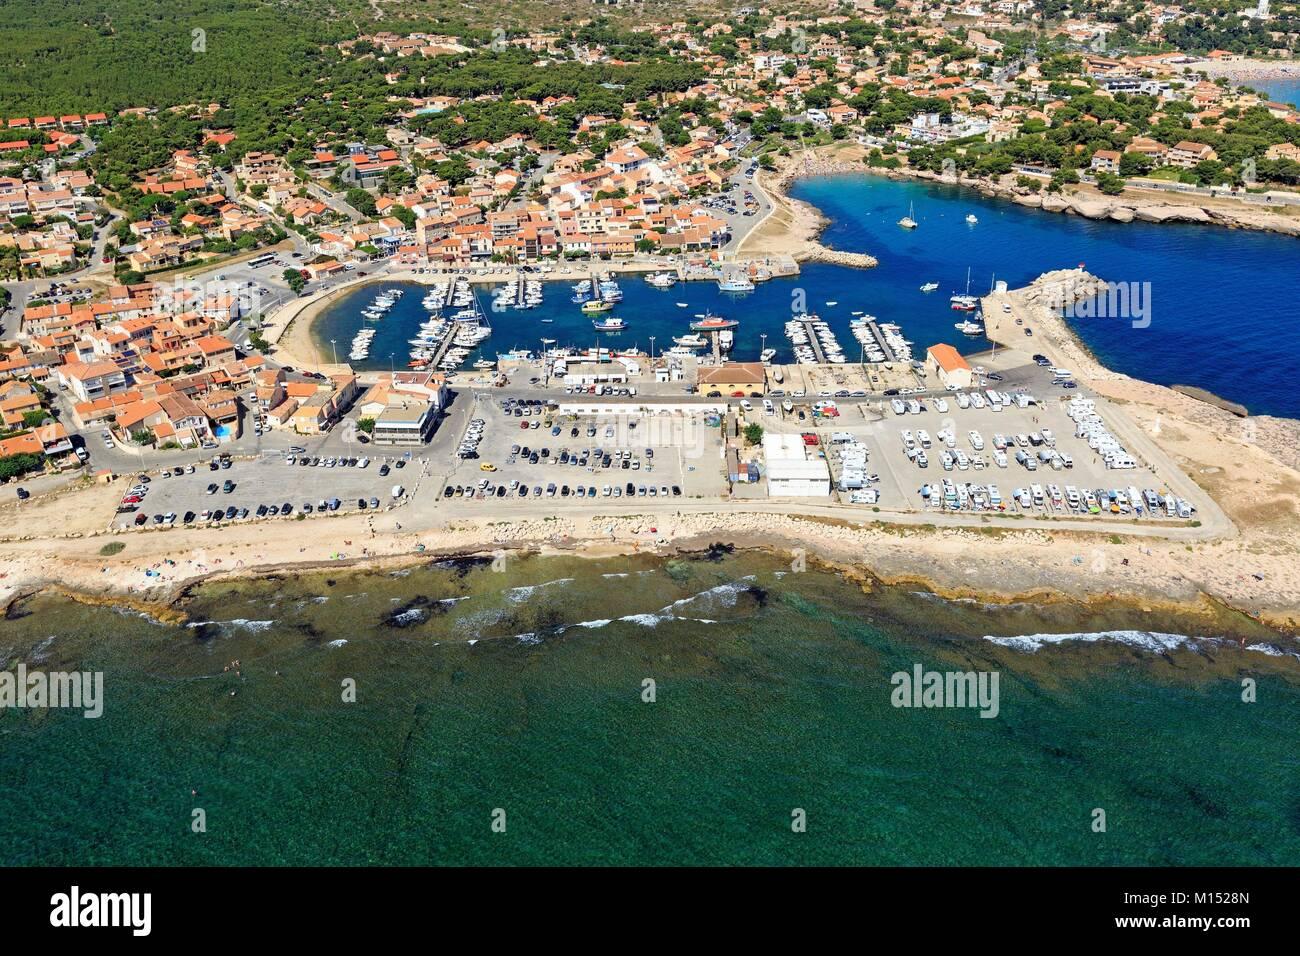 Francia, Bouches du Rhone, Martigues, carro de distrito (vista aérea) Imagen De Stock